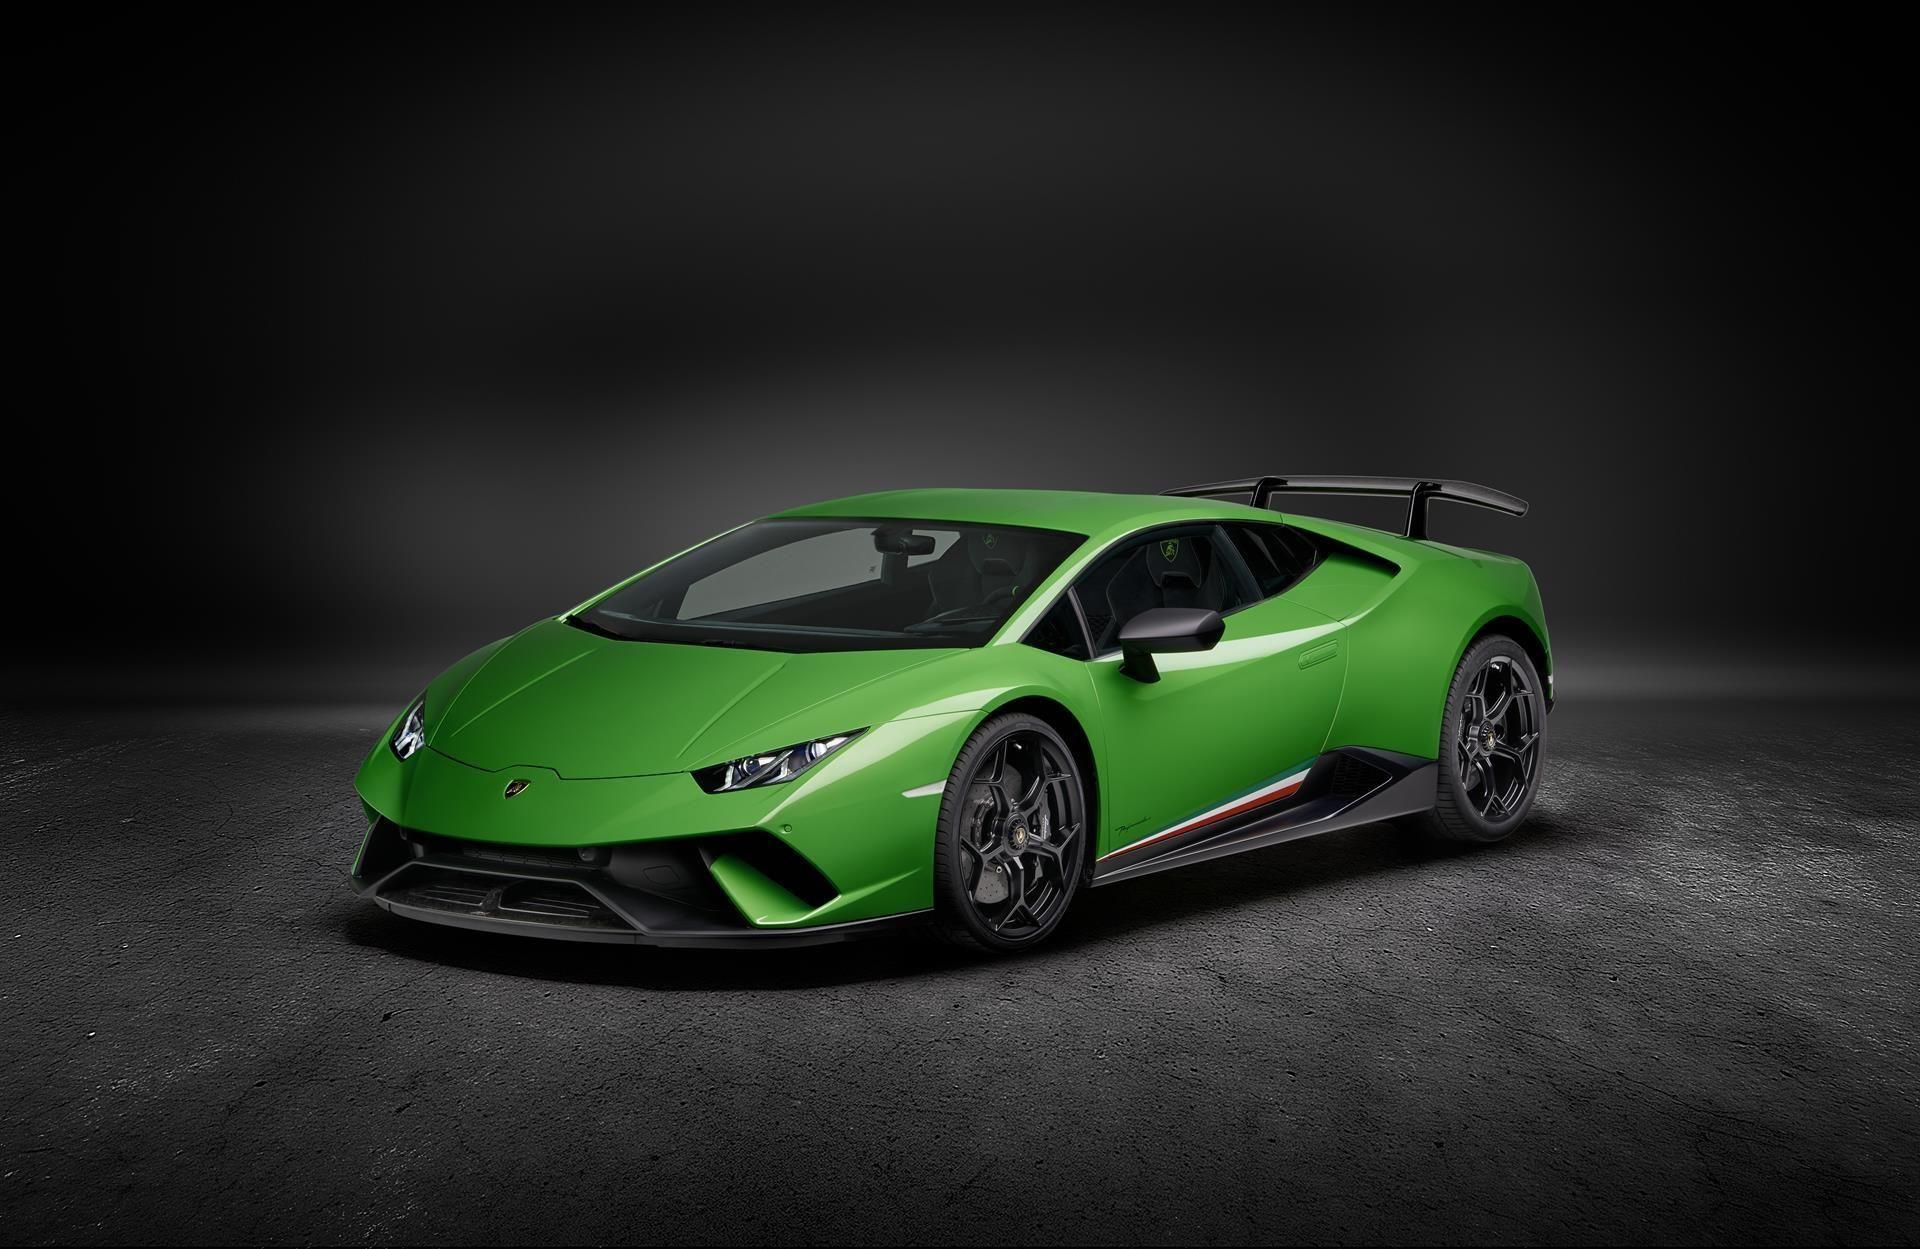 91909f21eabe2288410f6a10eb7b794b Mesmerizing Lamborghini Huracan Price In south Africa Cars Trend